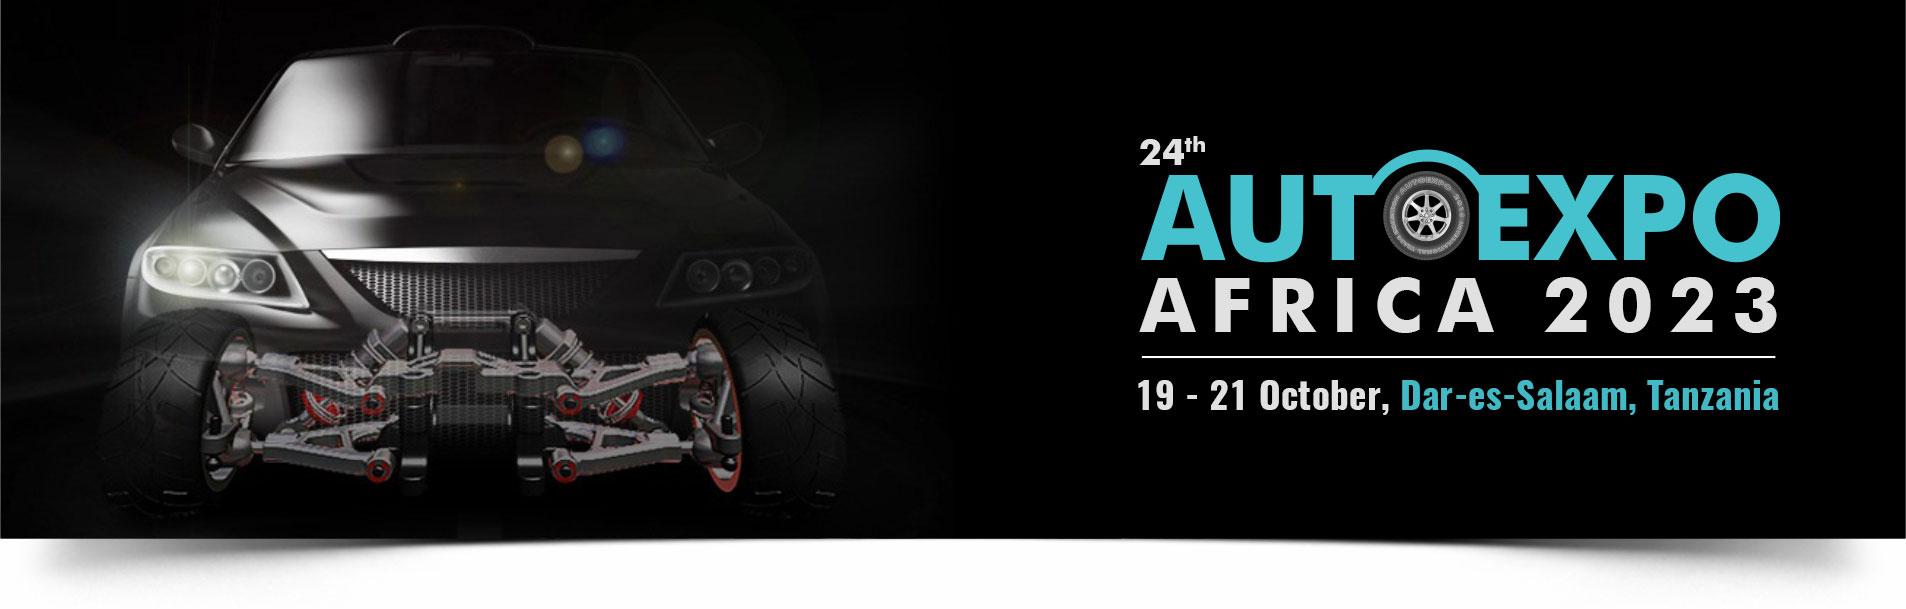 Exhibitor List | Autoexpo Tanzania 2019